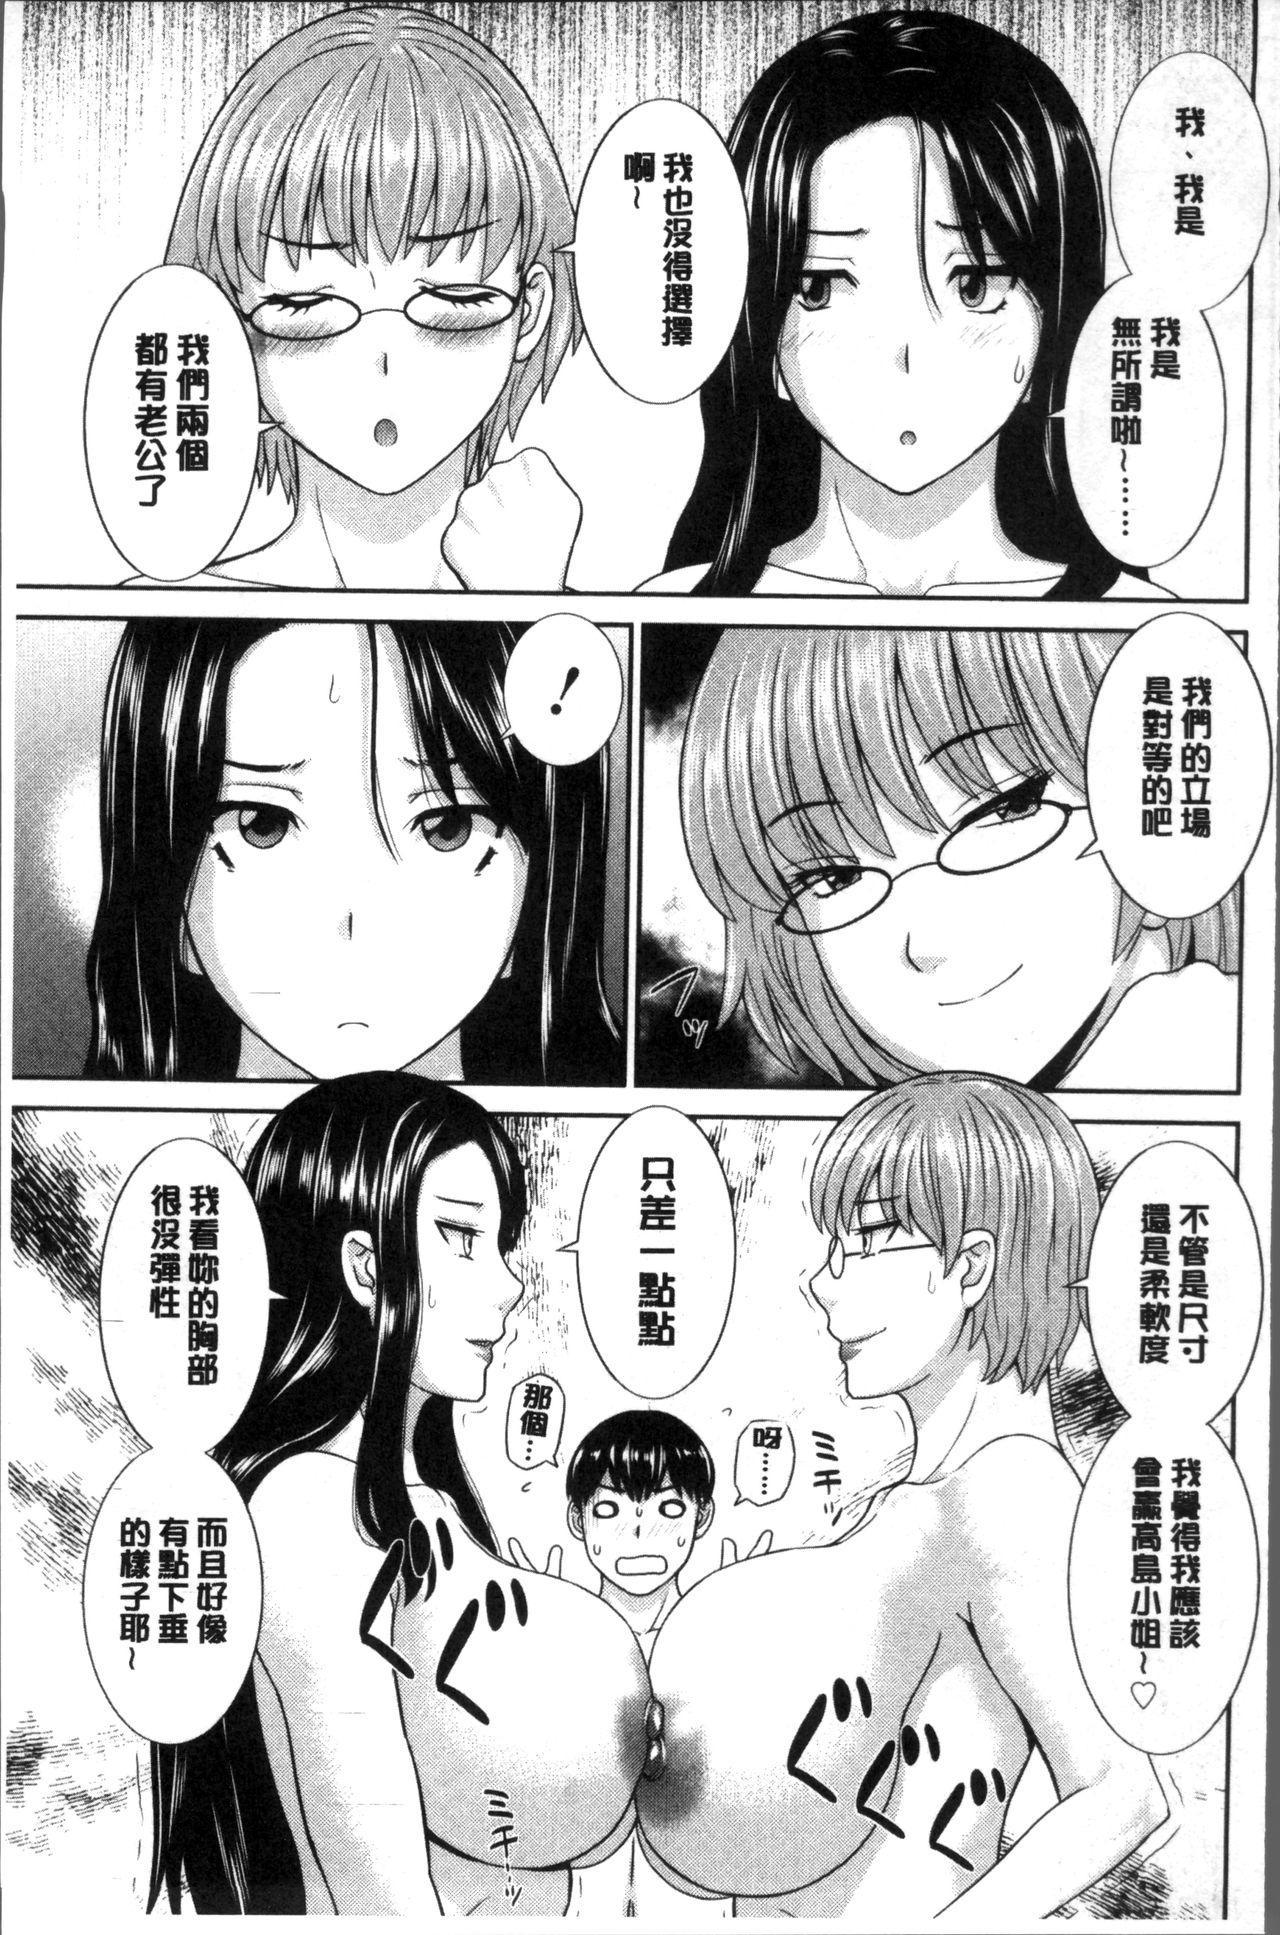 [Kawamori Misaki] Innyuu Shufu no Futei Ganbou - Oku-san to Kanojo to 2 | 淫乳主婦的不貞願望 和人妻也和女友❤2 [Chinese] 104